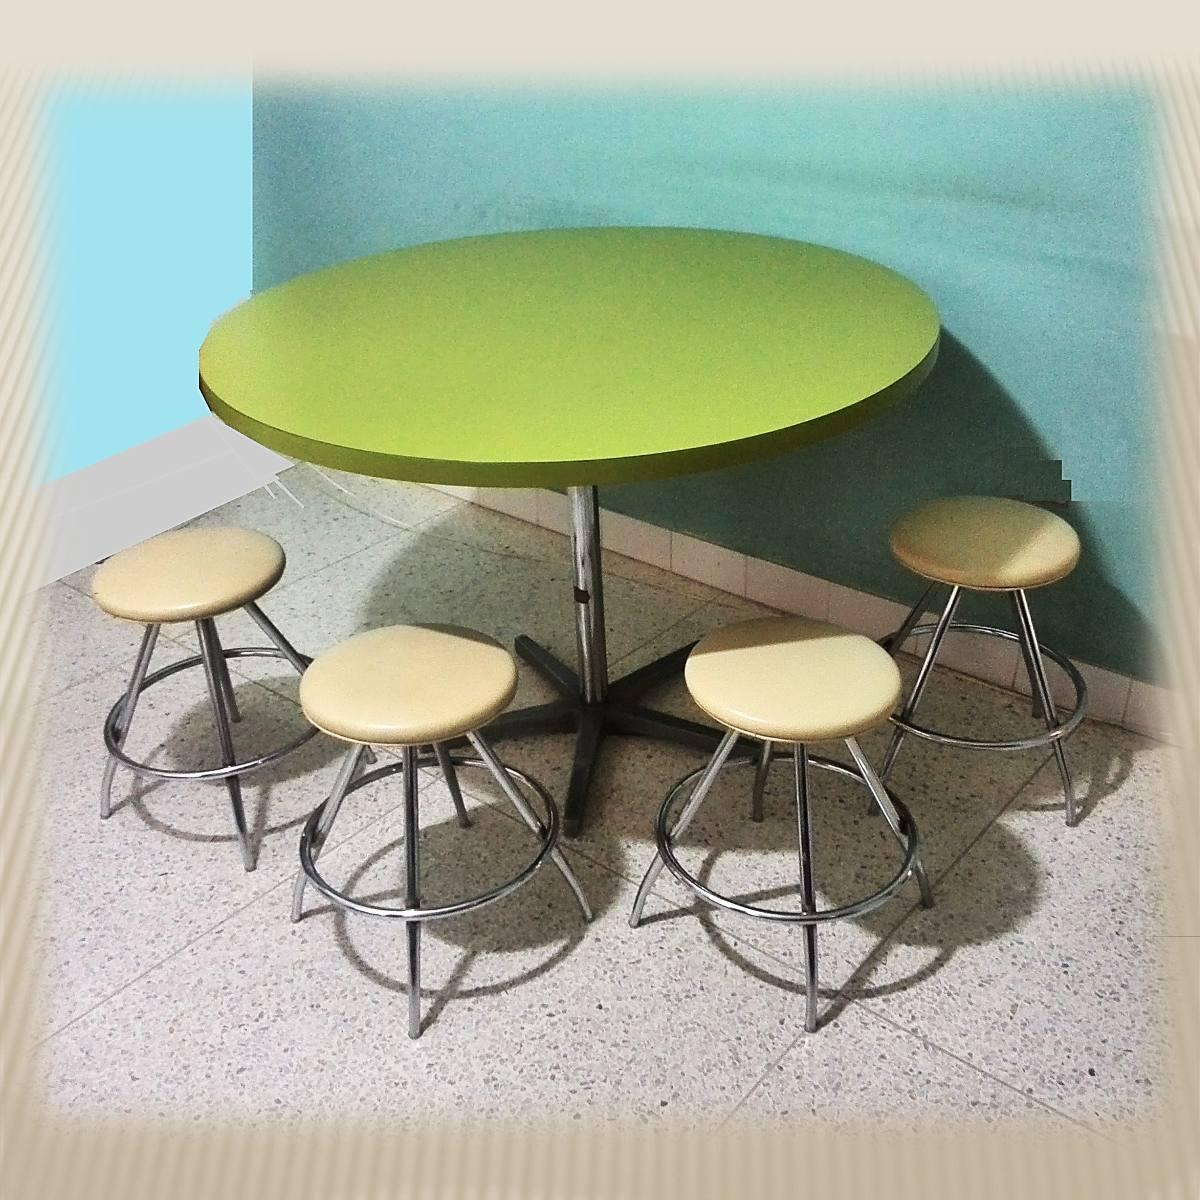 Mesa de comedor redonda pantry en formica color verde bs - Mesa salon redonda ...